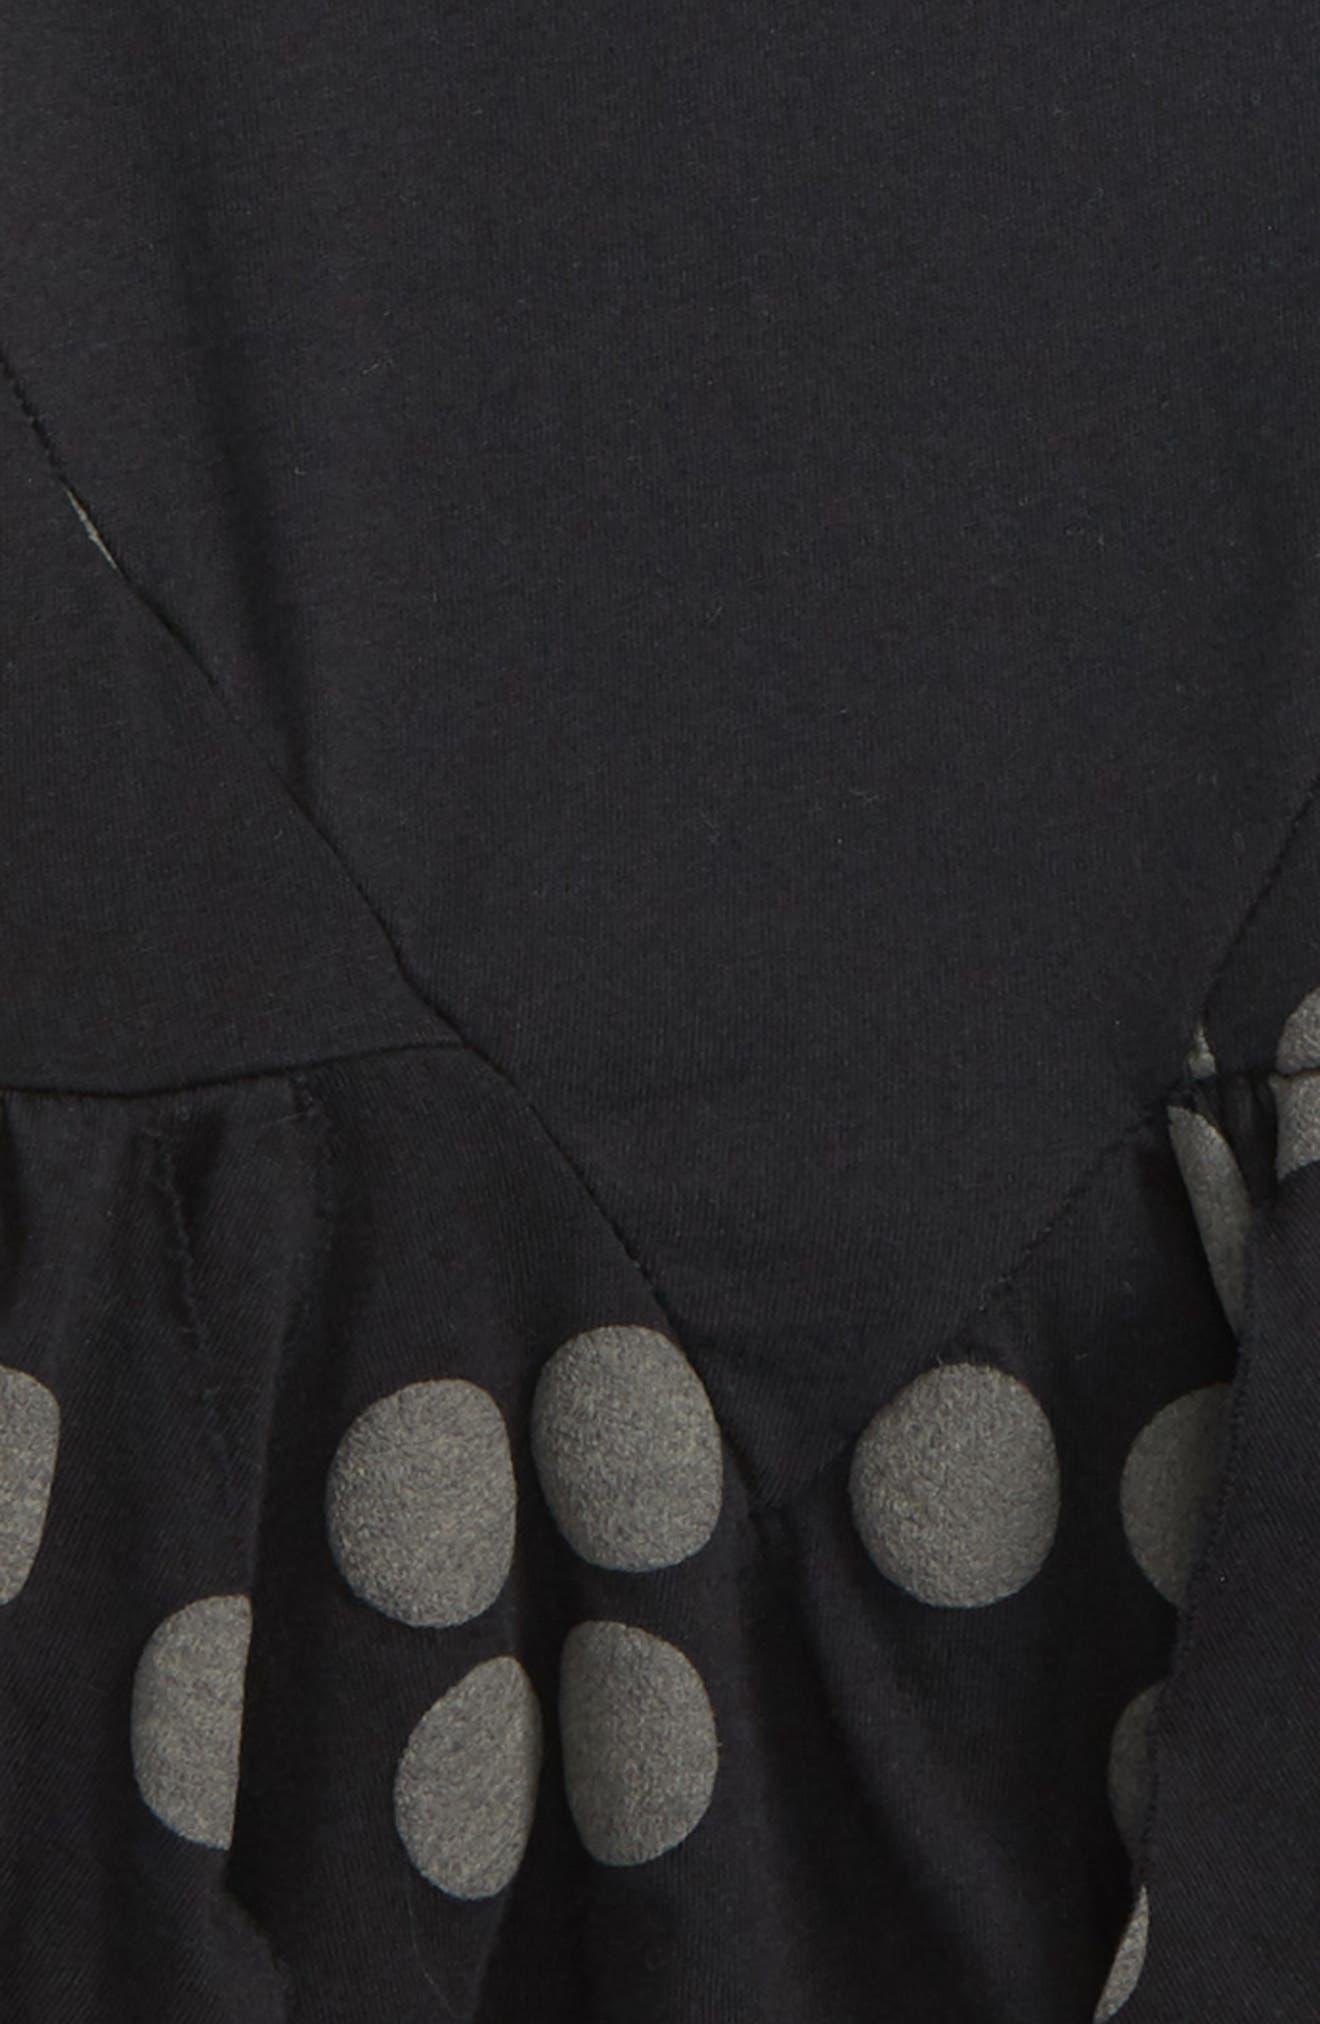 Braille Dot Layered Tank Dress,                             Alternate thumbnail 2, color,                             001